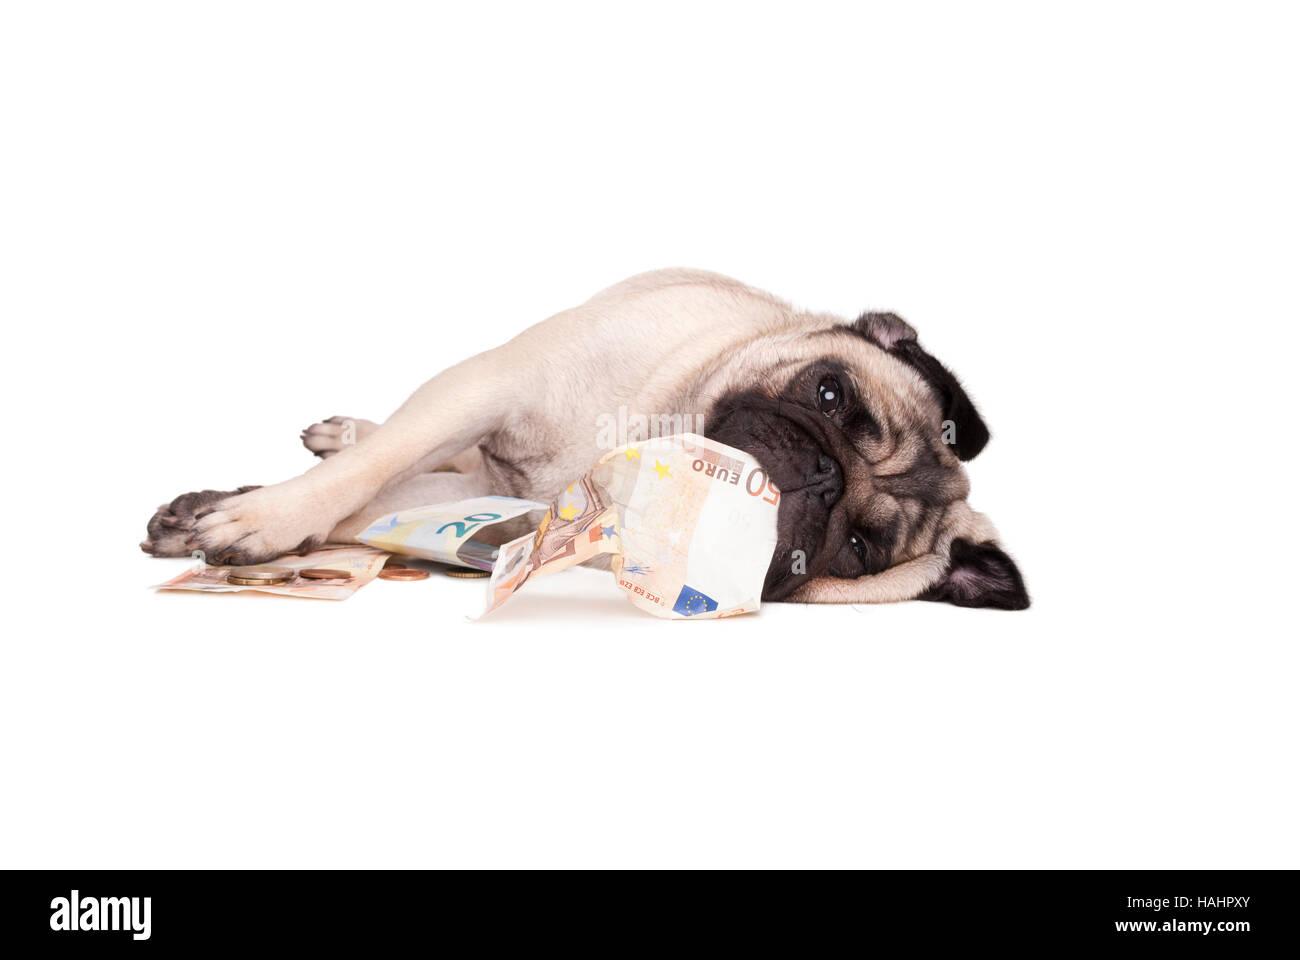 pug dog puppy playing around with money, euro - Stock Image